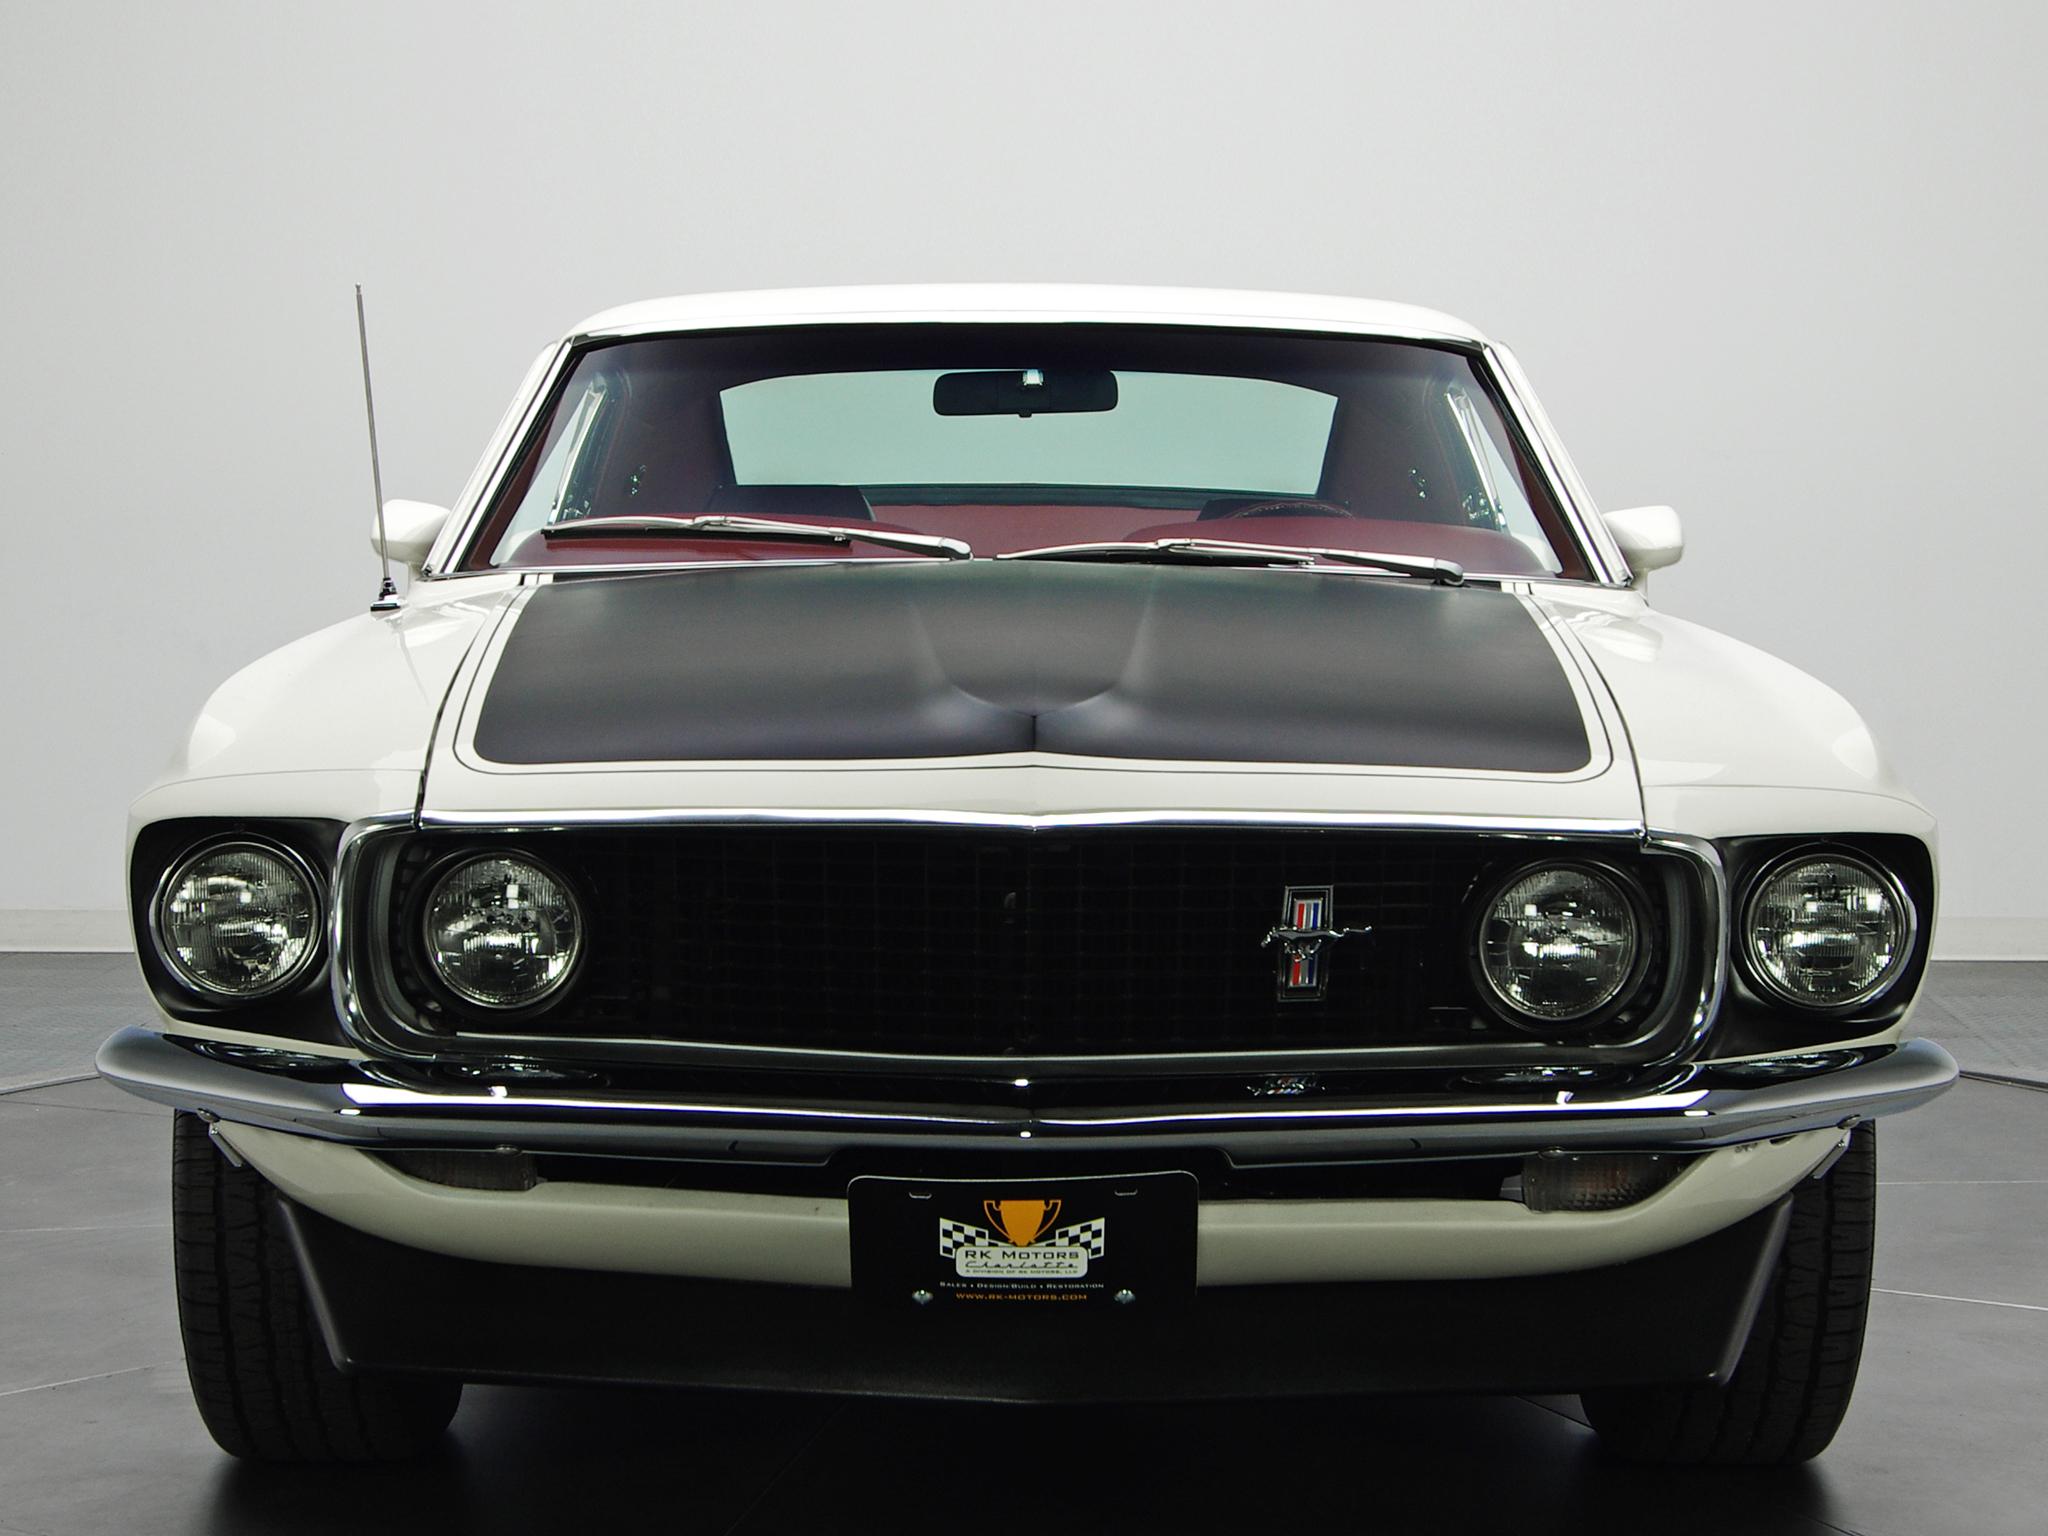 1969 Ford Mustang Boss 302 Muscle Classic H Wallpaper 2048x1536 114838 Wallpaperup